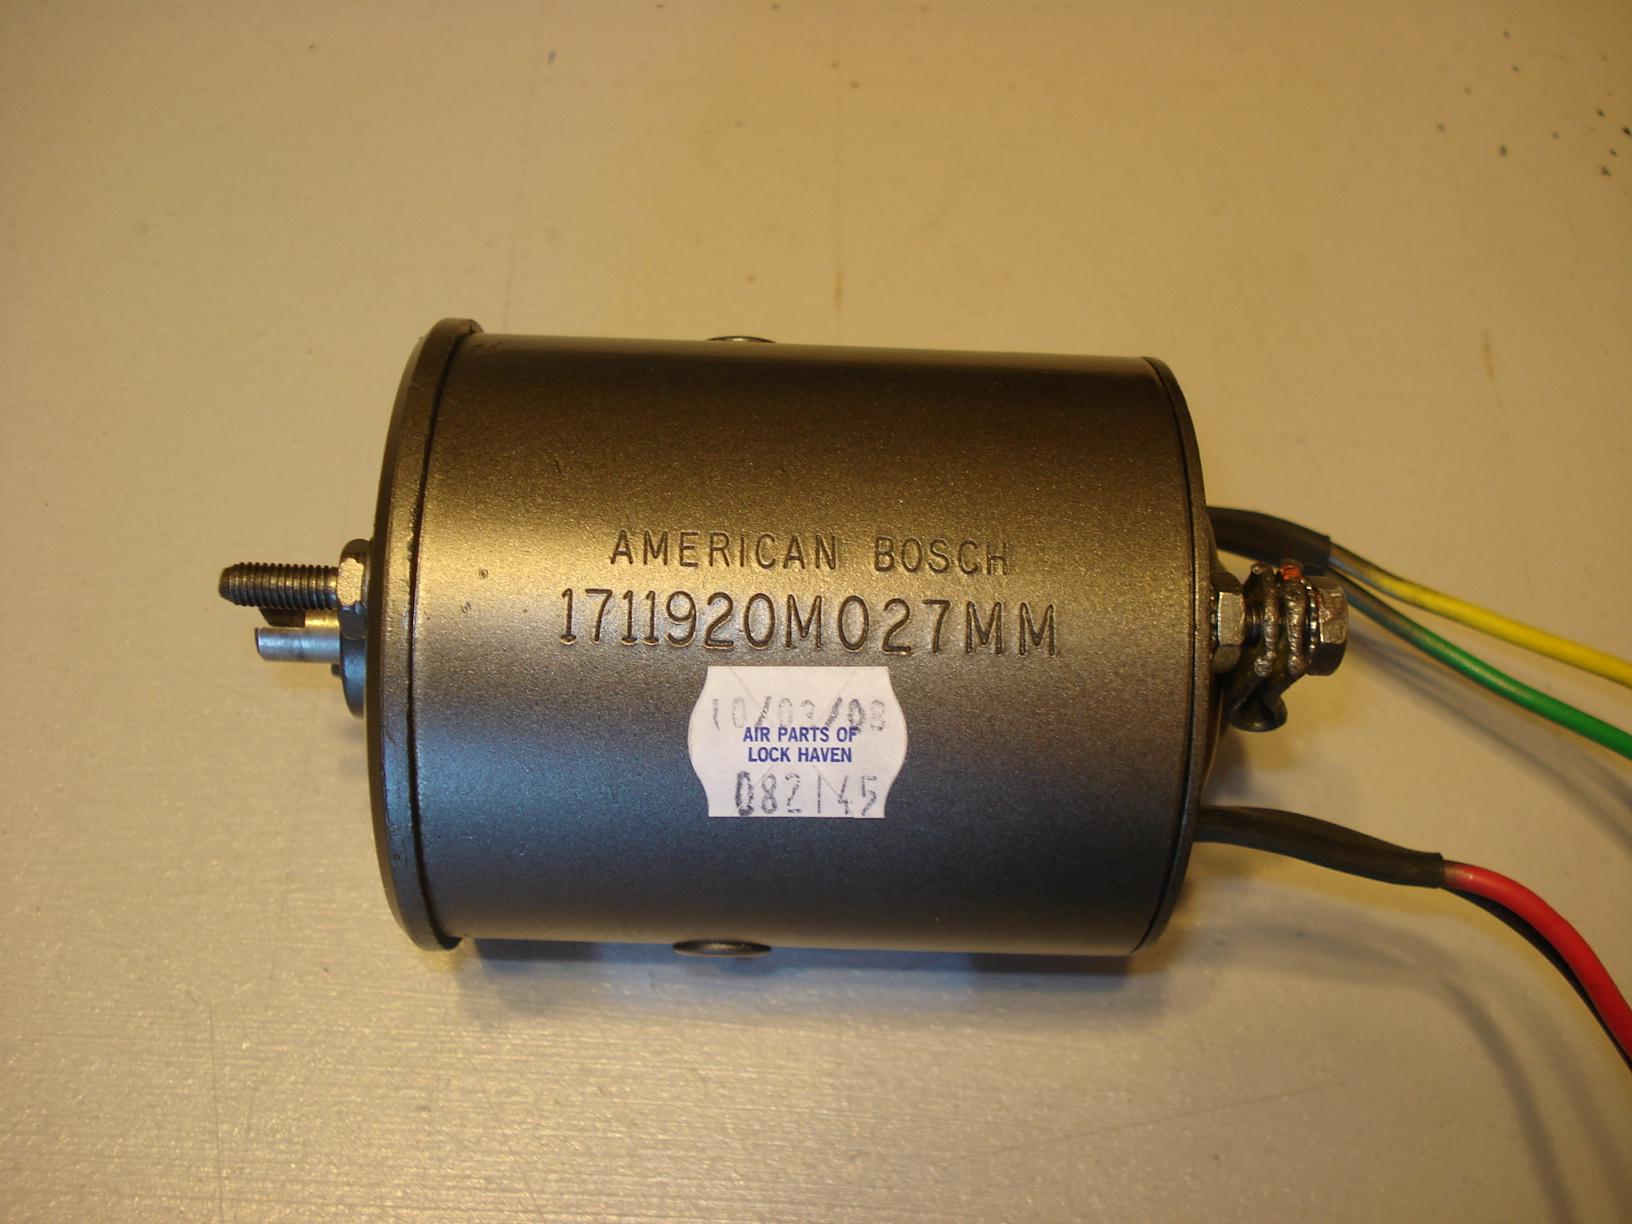 21286-000 landing gear retraction motor